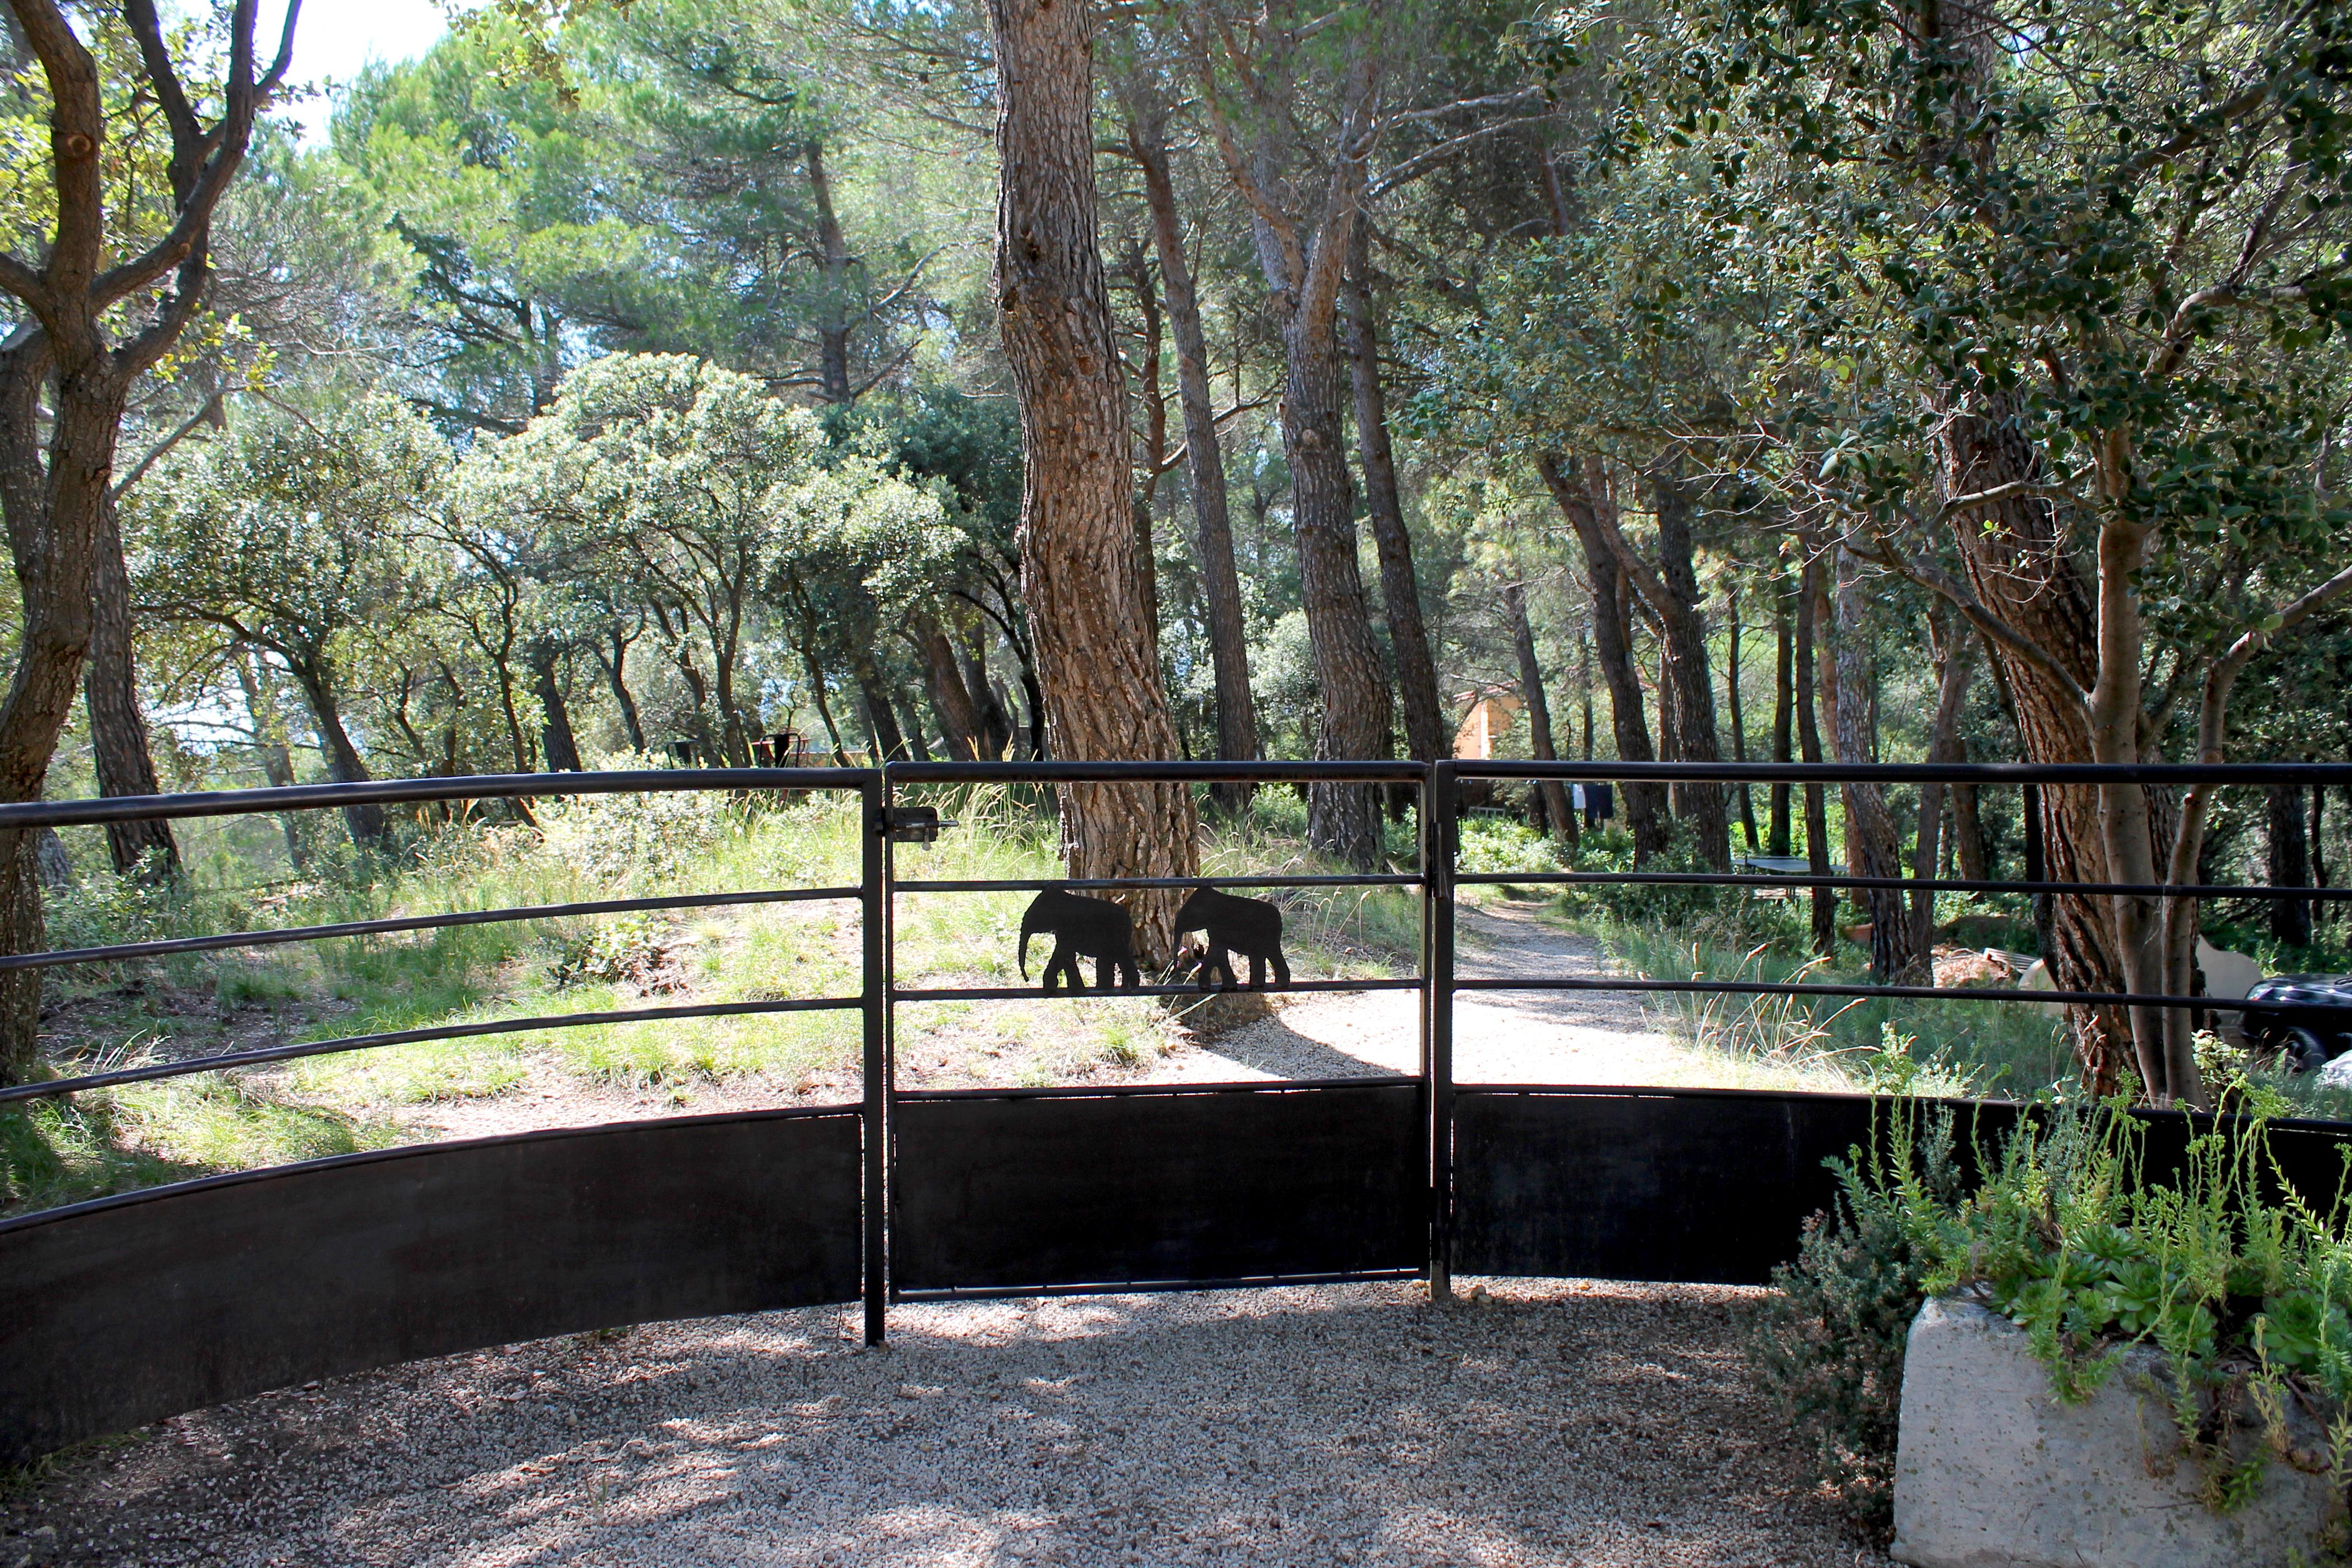 elephant-de-vaugines-provence-lustforthesublime